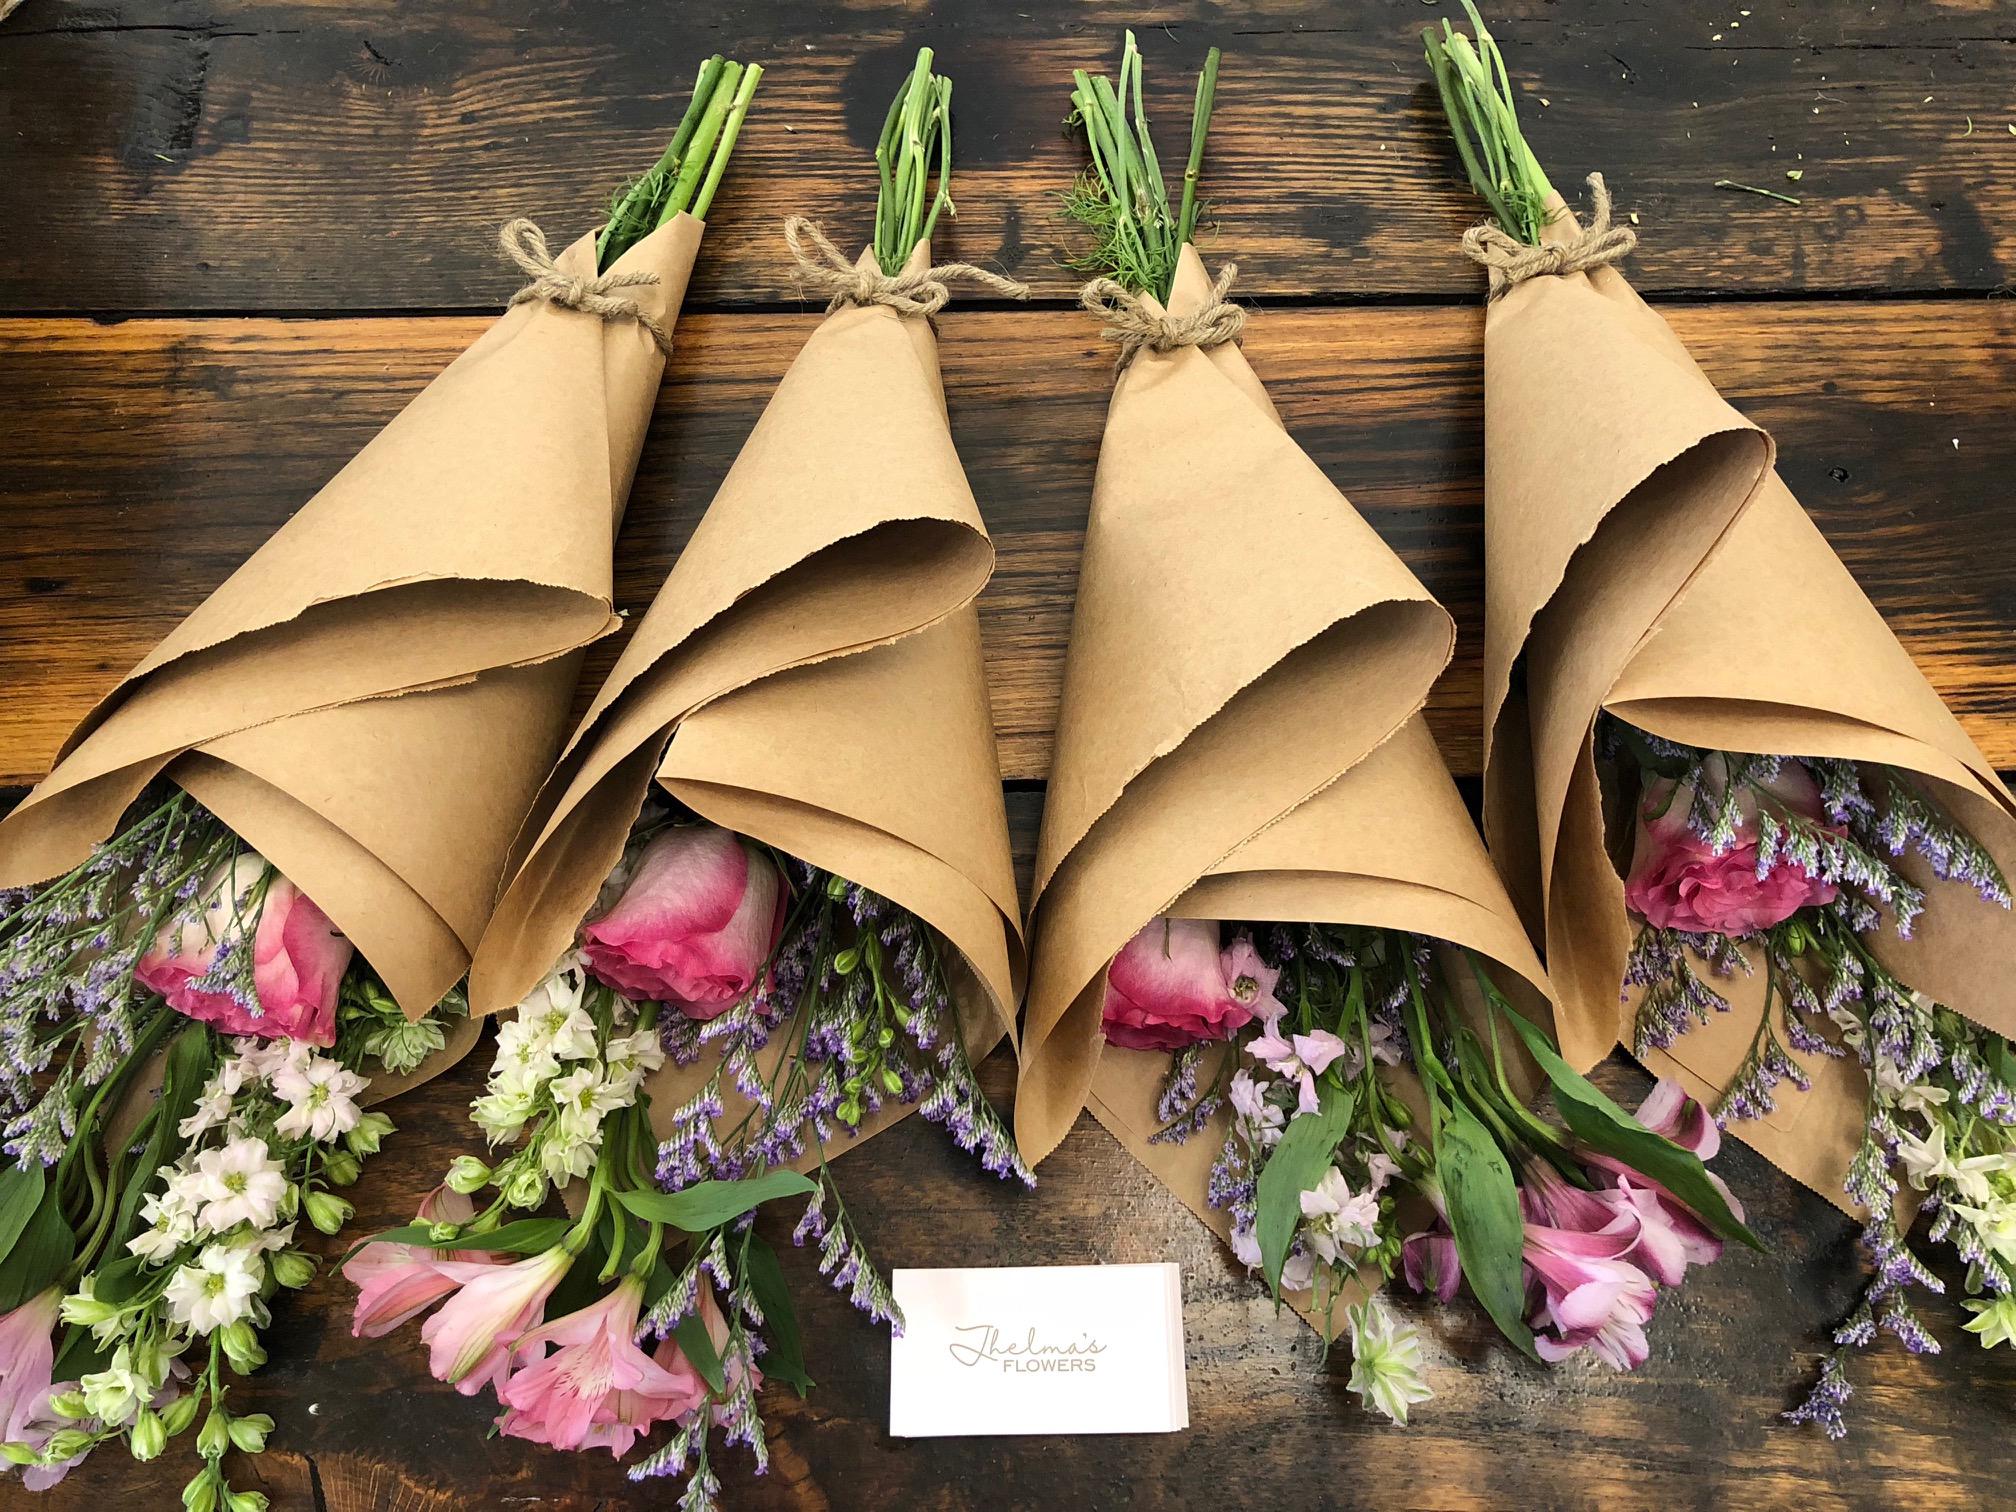 Photo courtesy of Thelma's Flowers